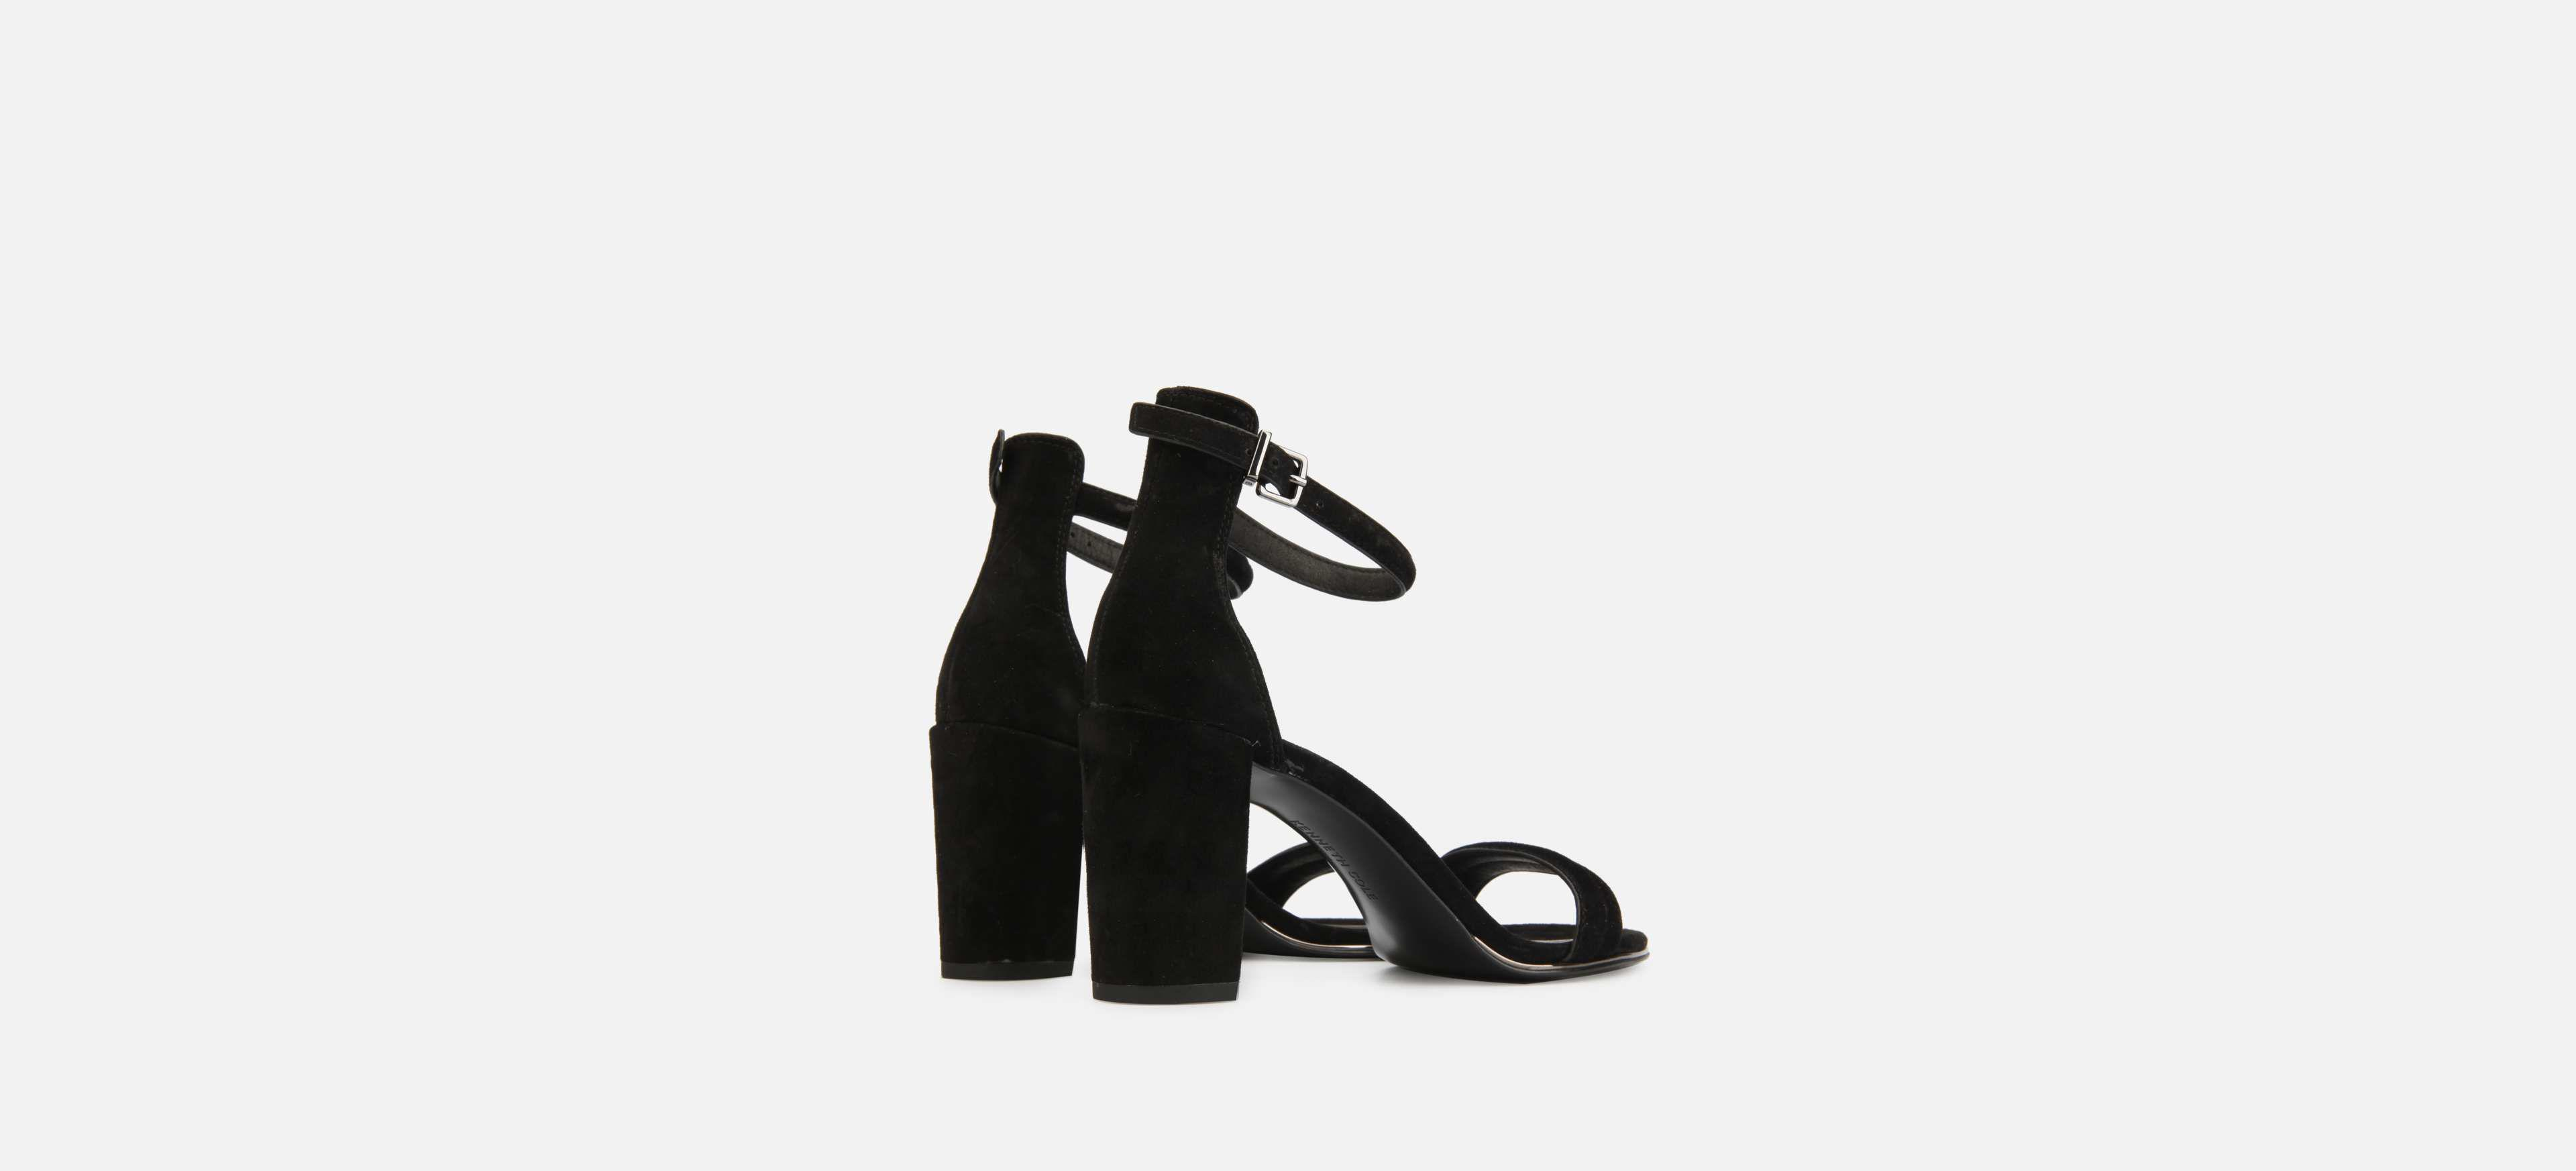 46a61cbaf68 Kenneth Cole - Black Lex Suede Ankle Strap Sandal Heel - Lyst. View  fullscreen